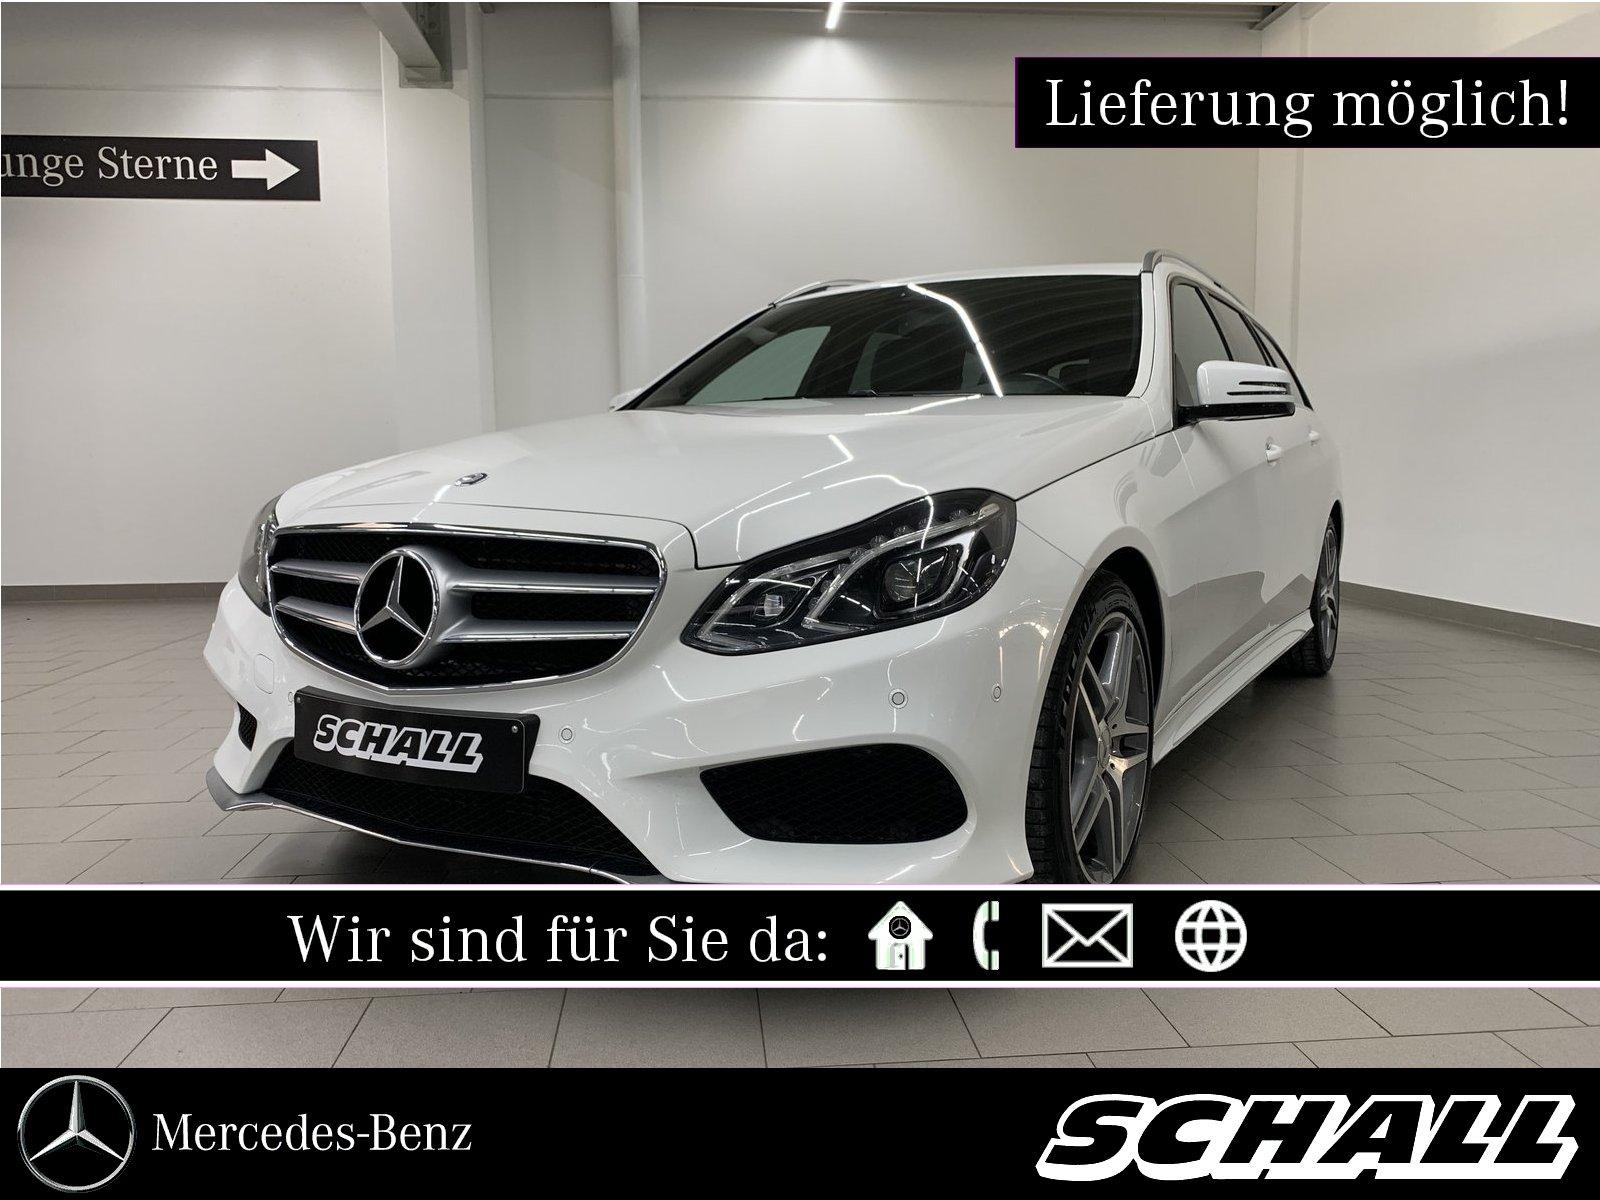 Mercedes-Benz E 250 BT T AMG+AHK+STANDHZG+LED INT.+PARKTRONIC, Jahr 2016, Diesel